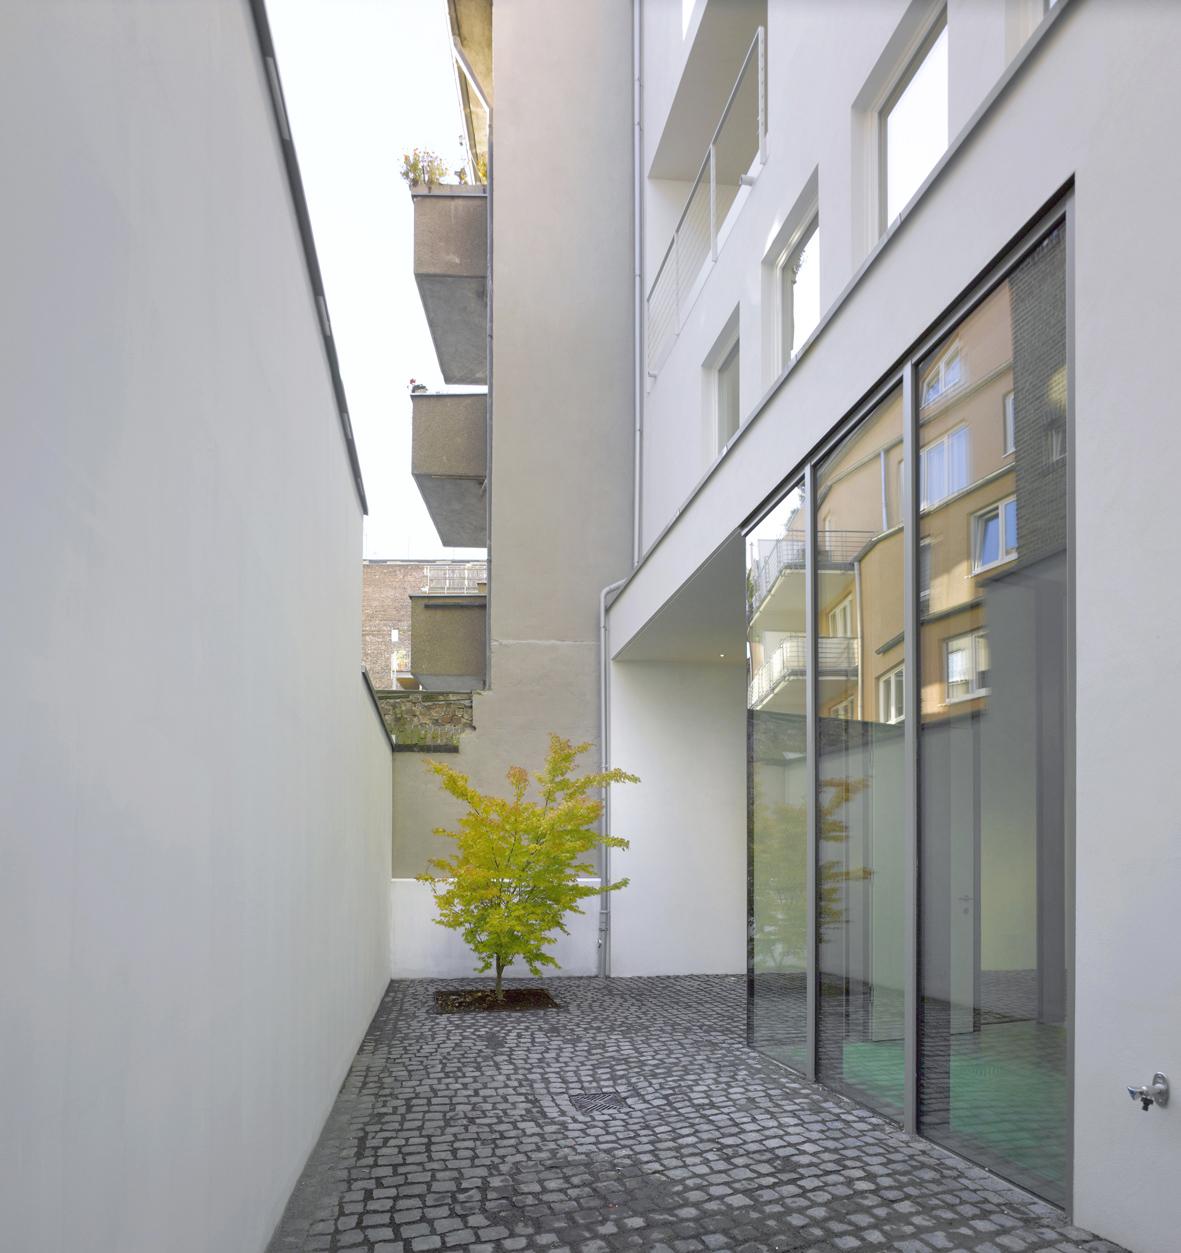 Stadthaus_Florastraße_14.jpg